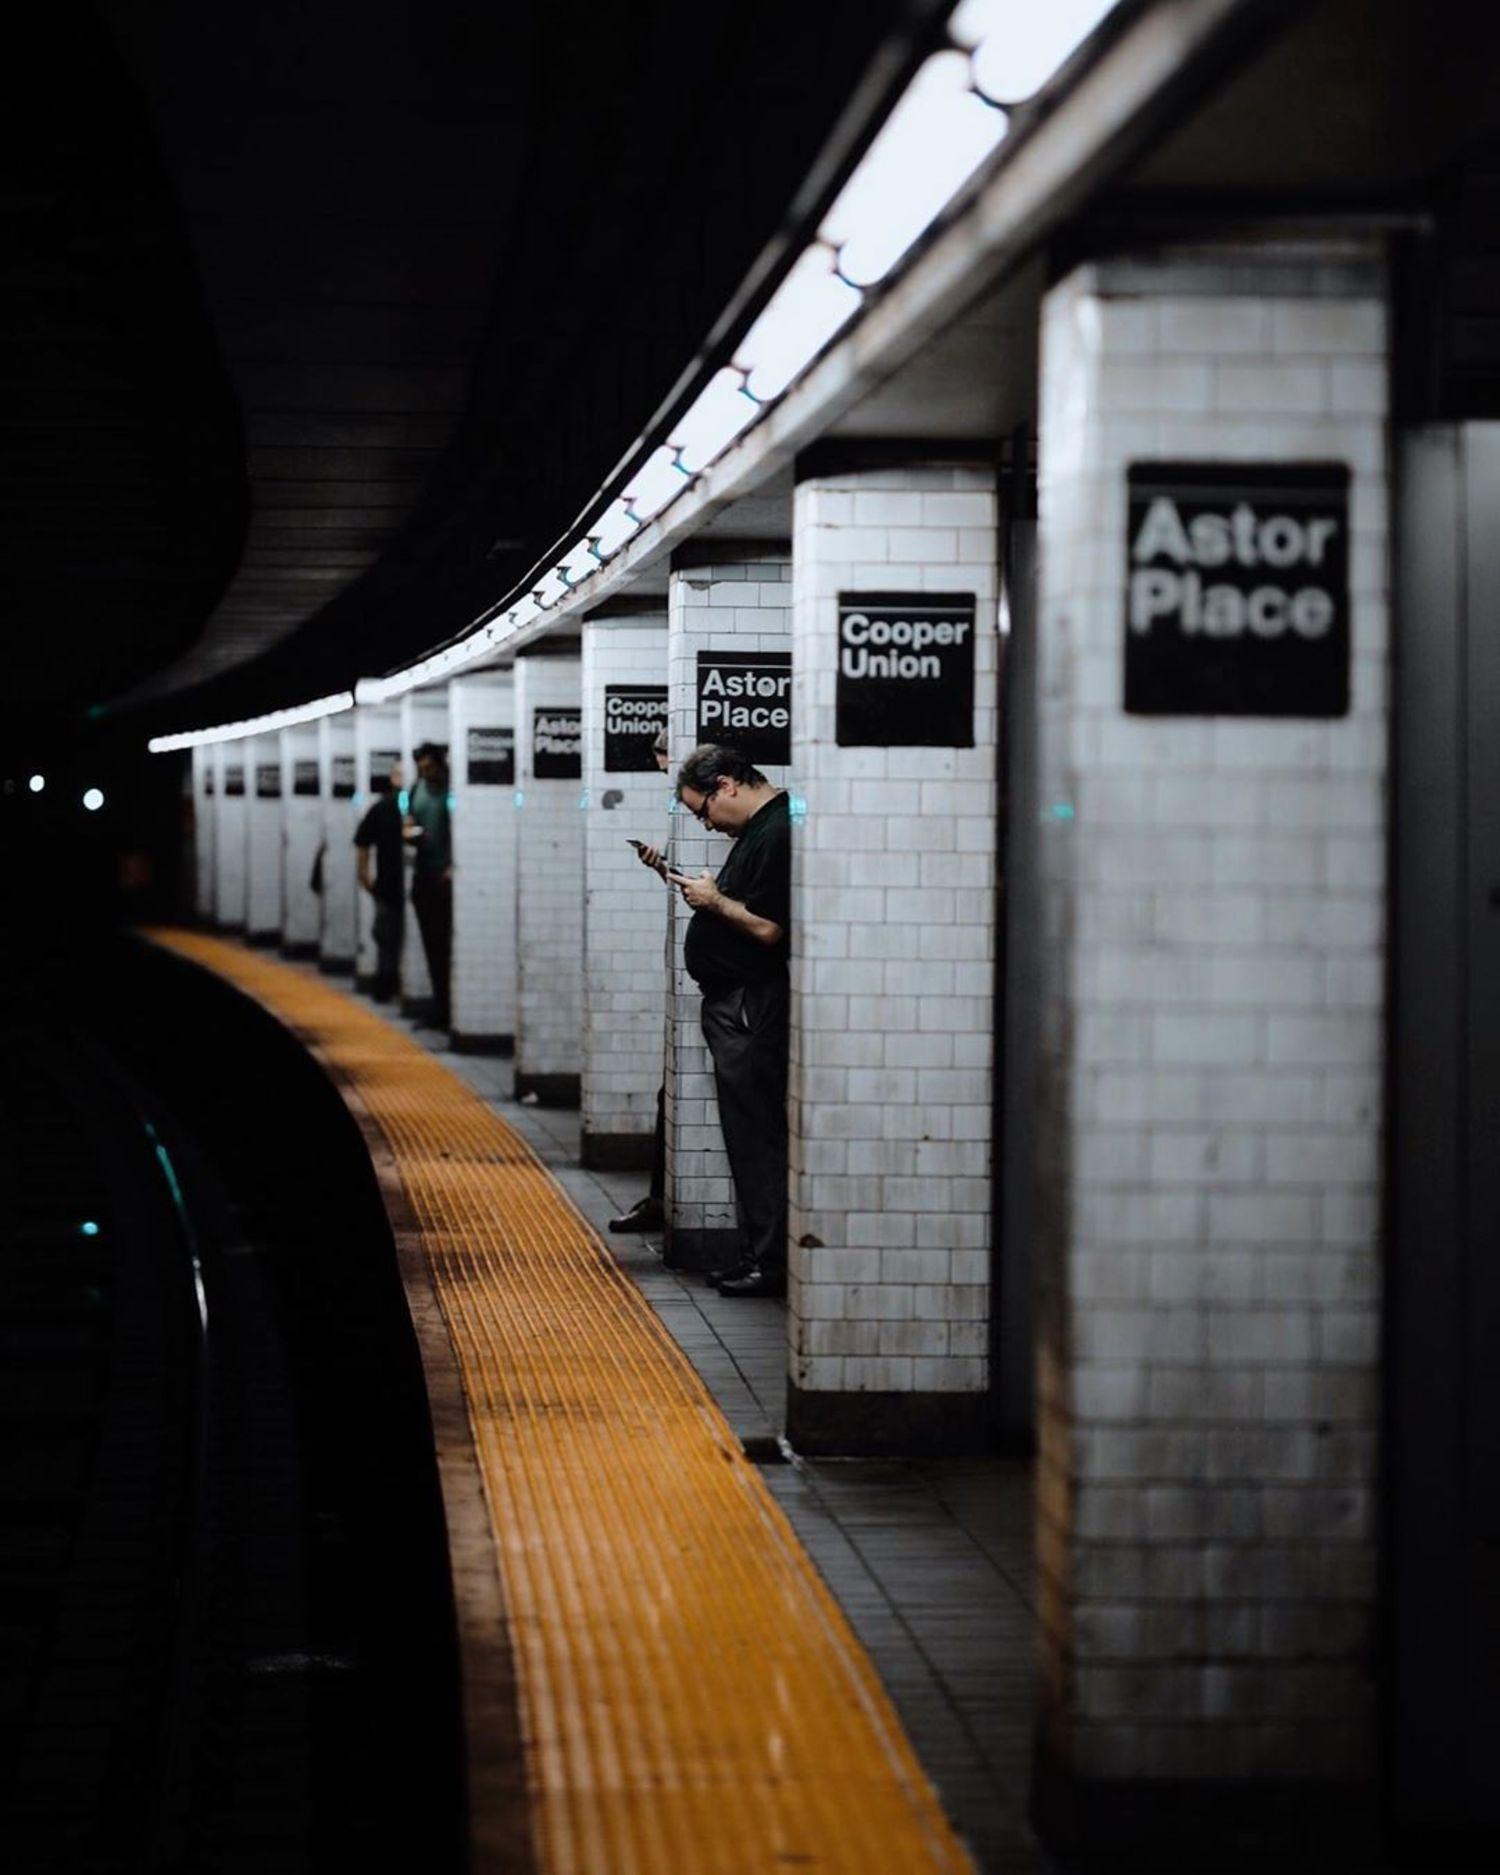 Astor Place Station, East Village, Manhattan